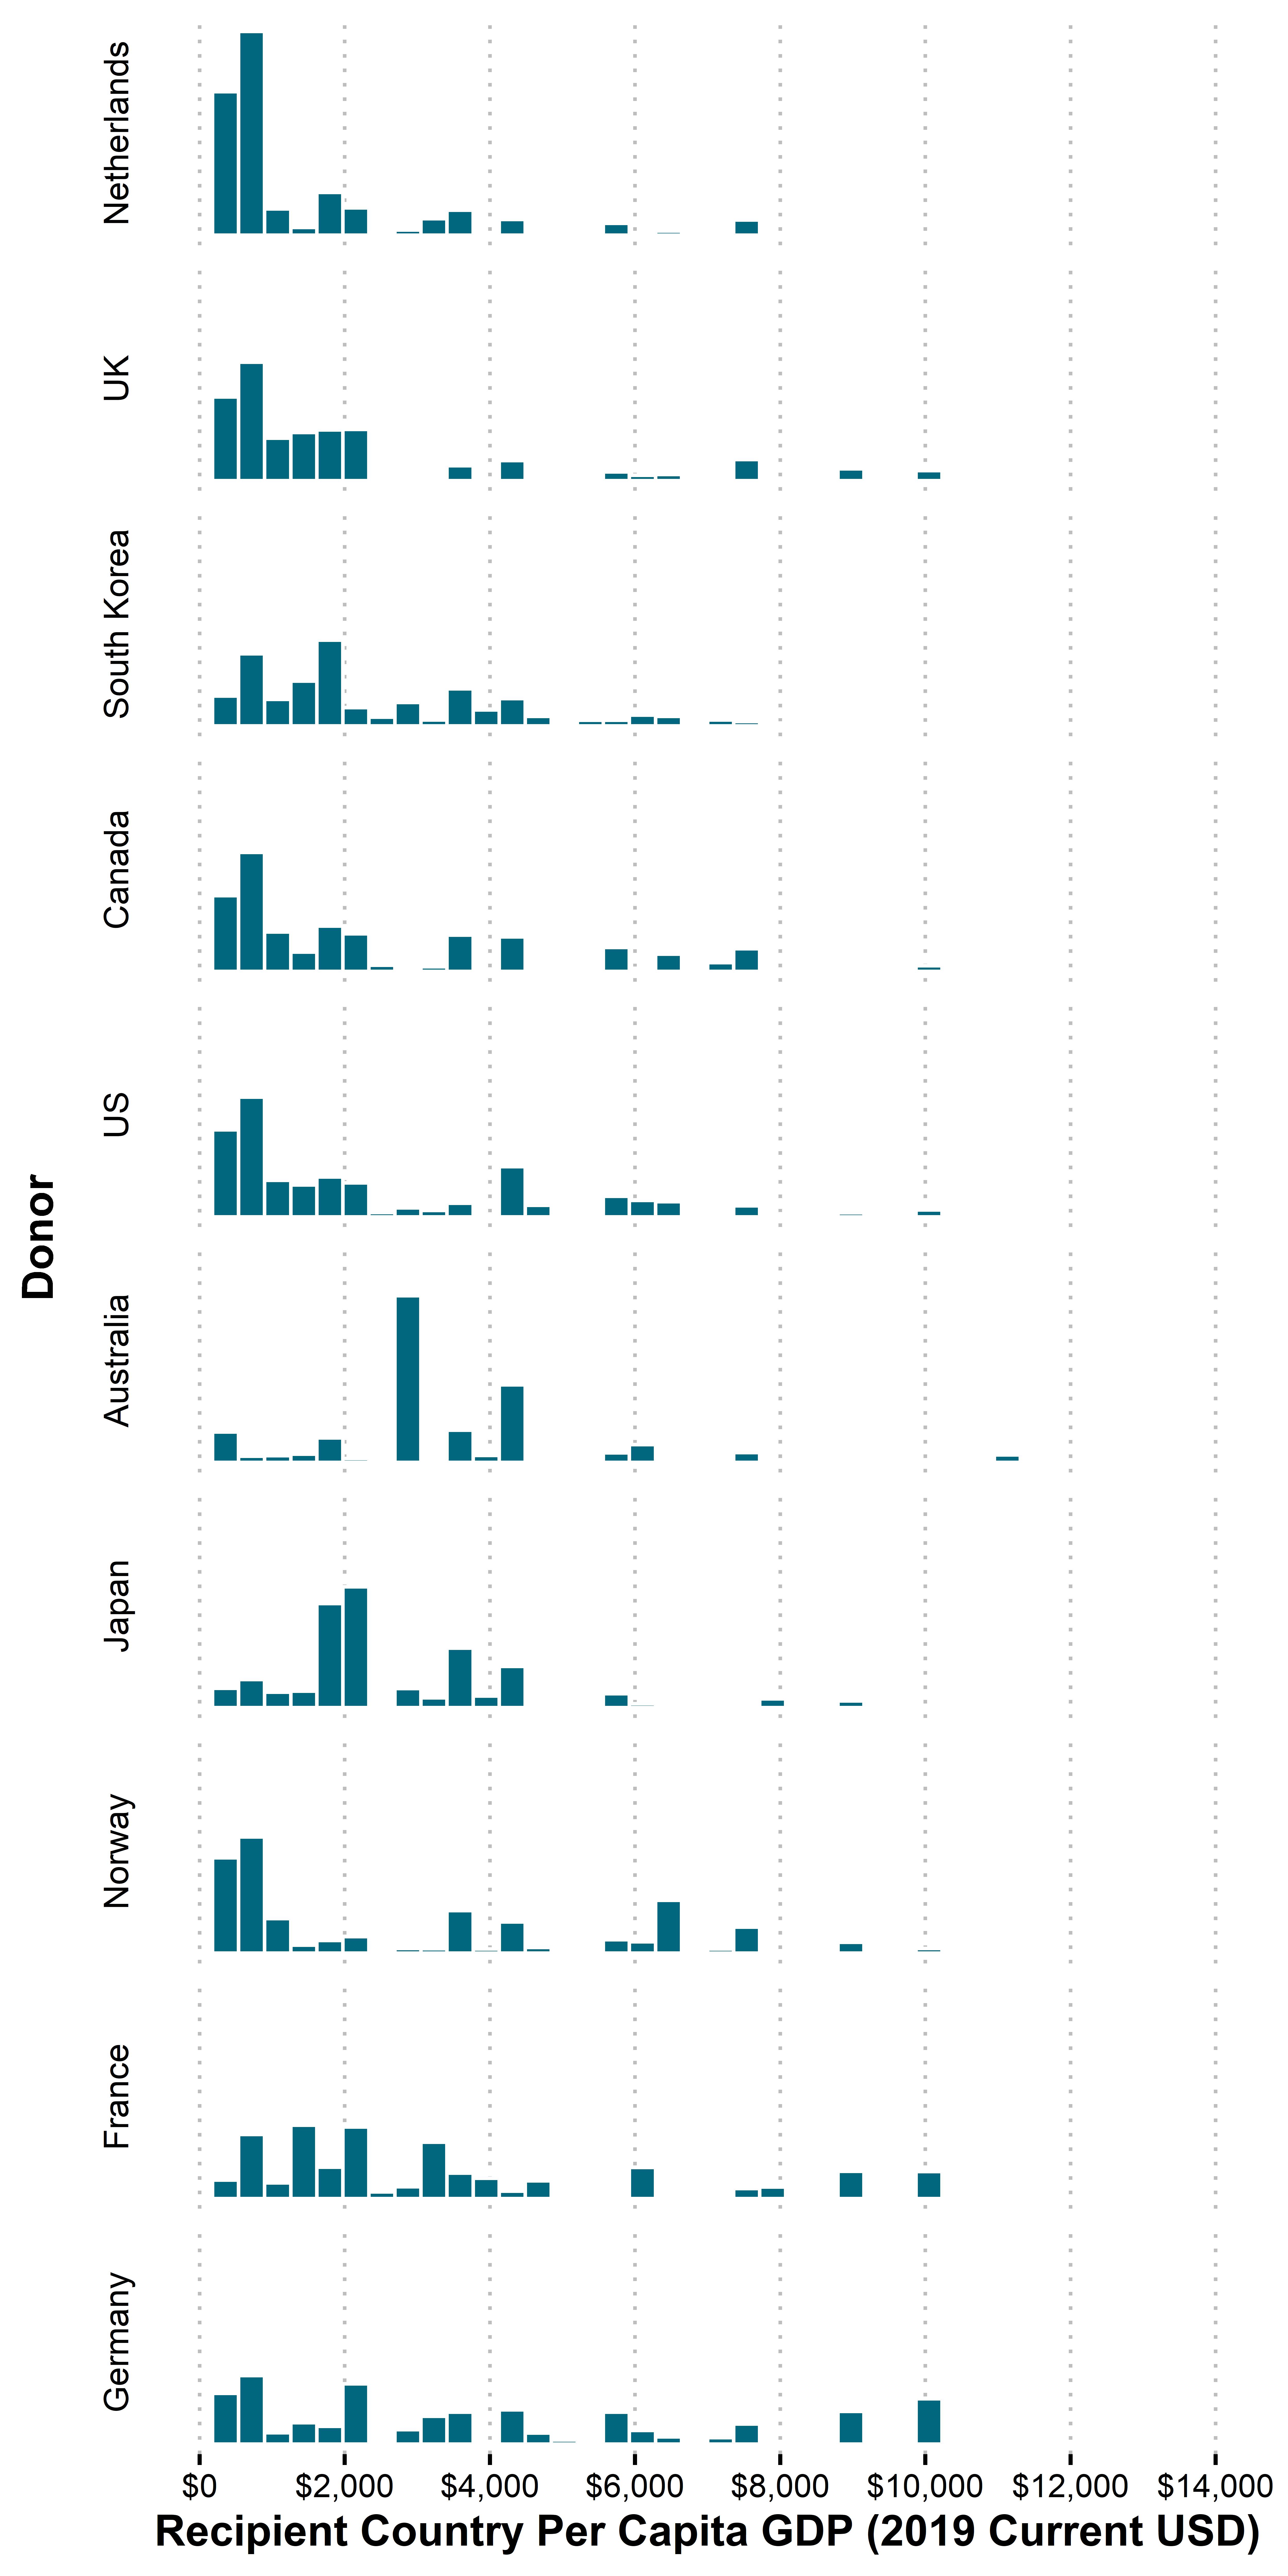 Figure 1. Where does DAC ODA go by recipient GDP per capita